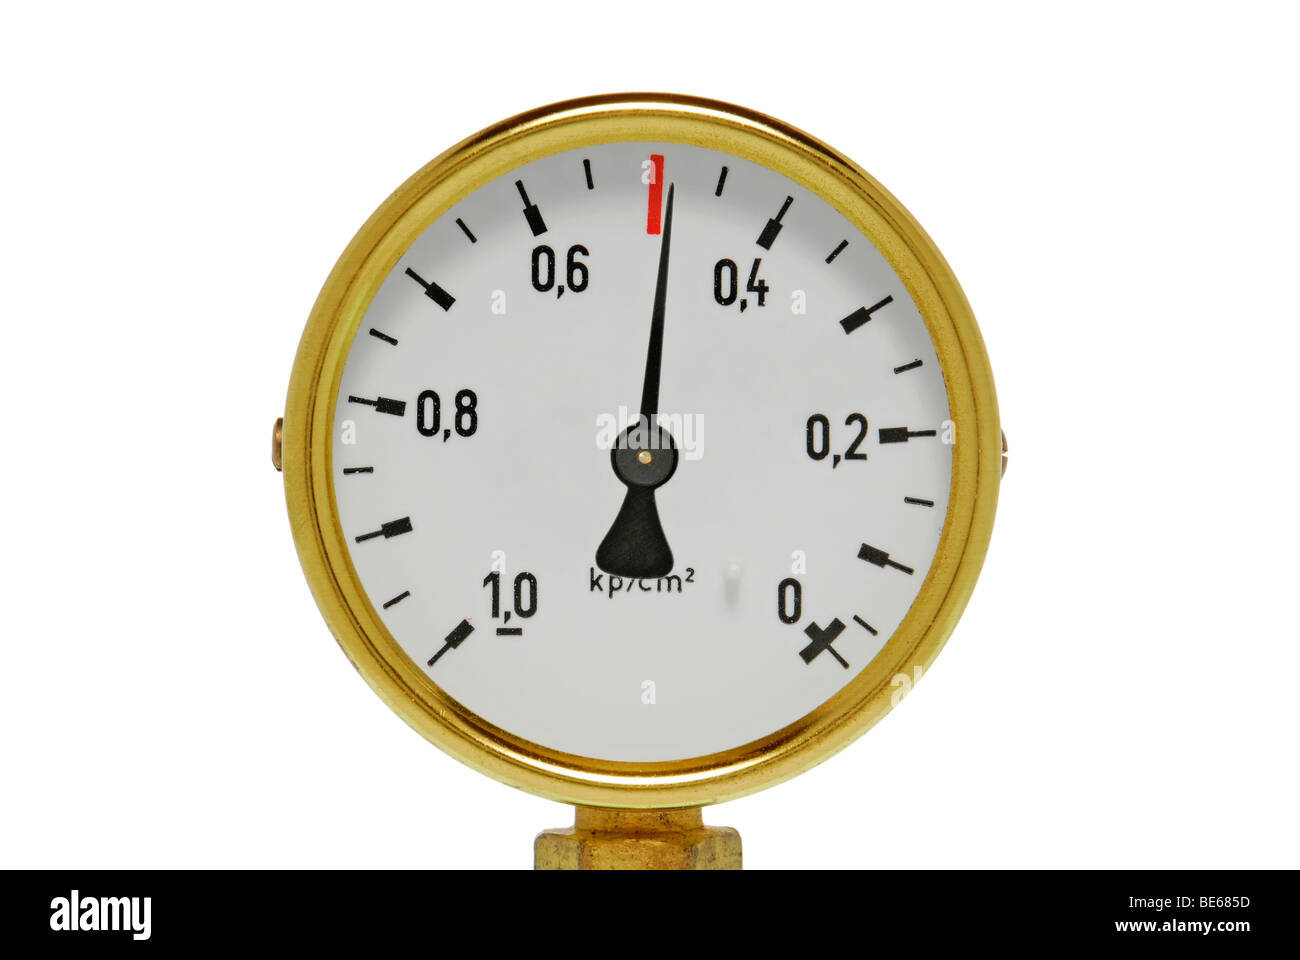 Pressure gauge, manometer just before over pressure, symbolic image for being under pressure - Stock Image